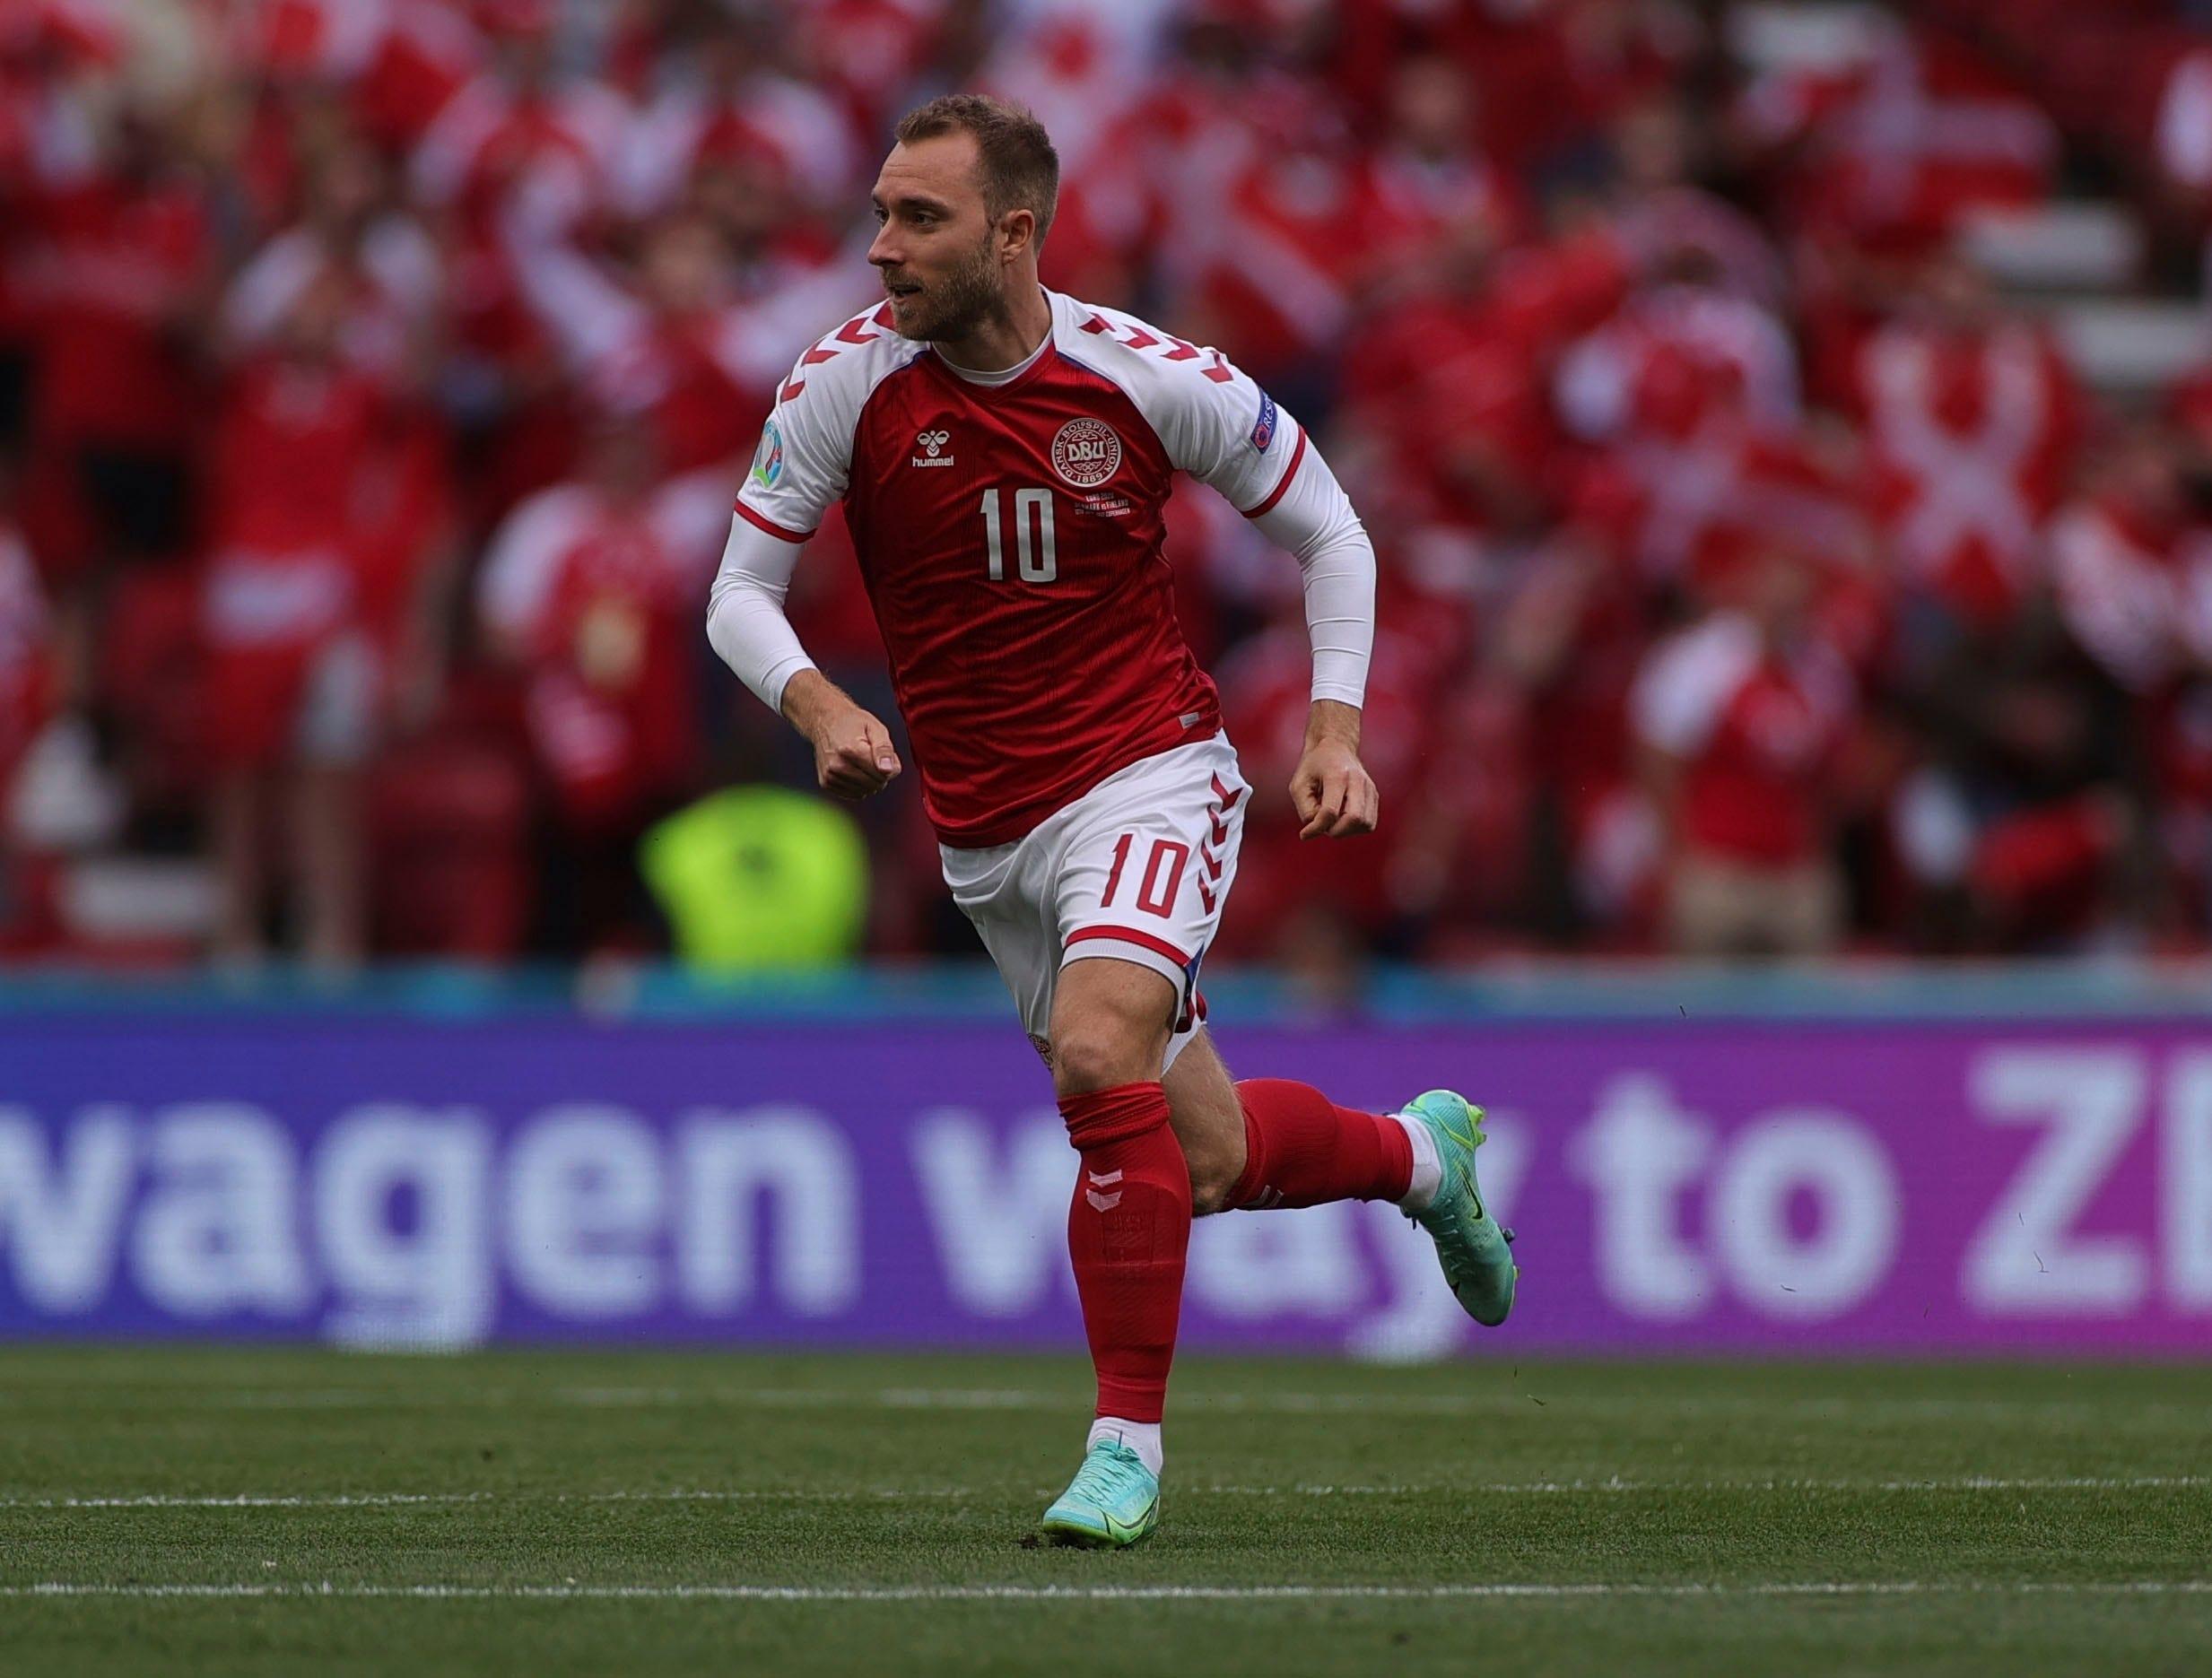 Denmark team doctor says Christian Eriksen suffered cardiac arrest at Euro 2020: 'He was gone'